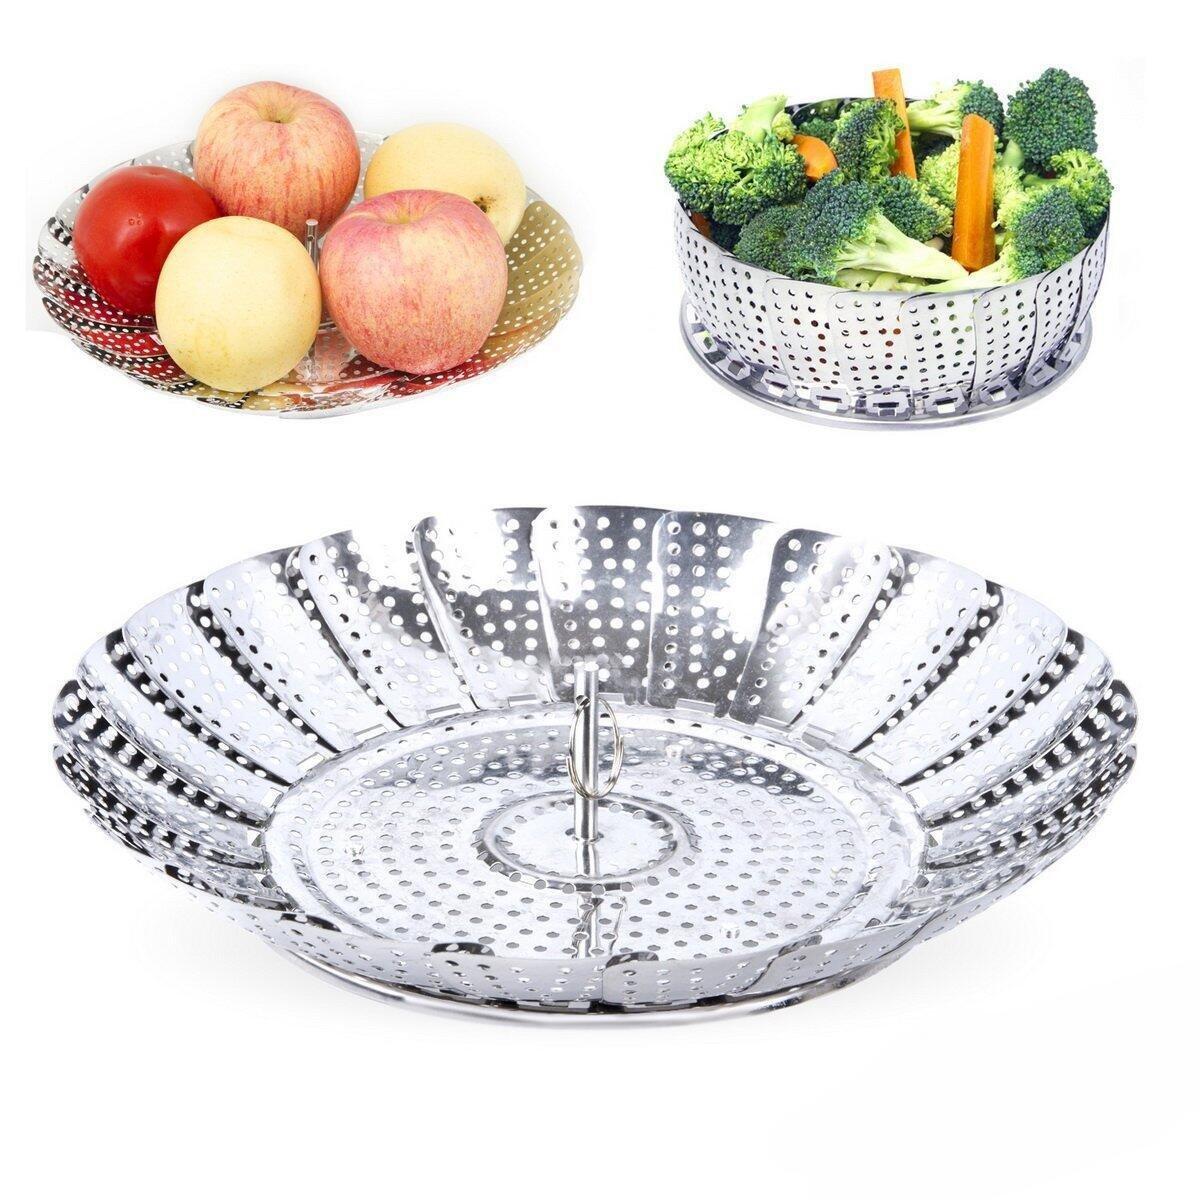 Vegetable Steamer 100% Stainless Steel Basket Seafood Steamer Food Steamer Pasta Steamer 7